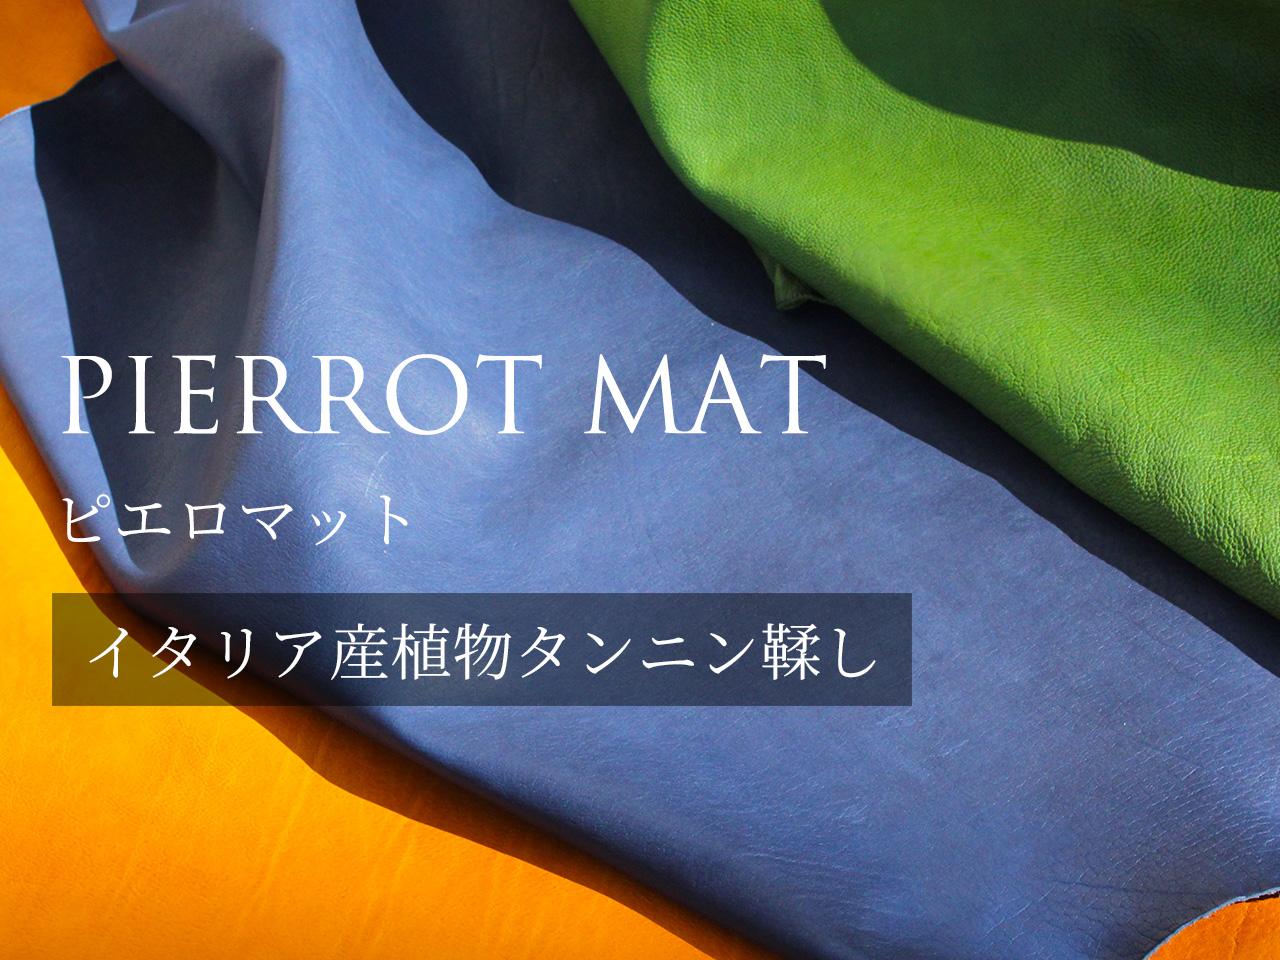 PIERROT MAT(ピエロマット)について